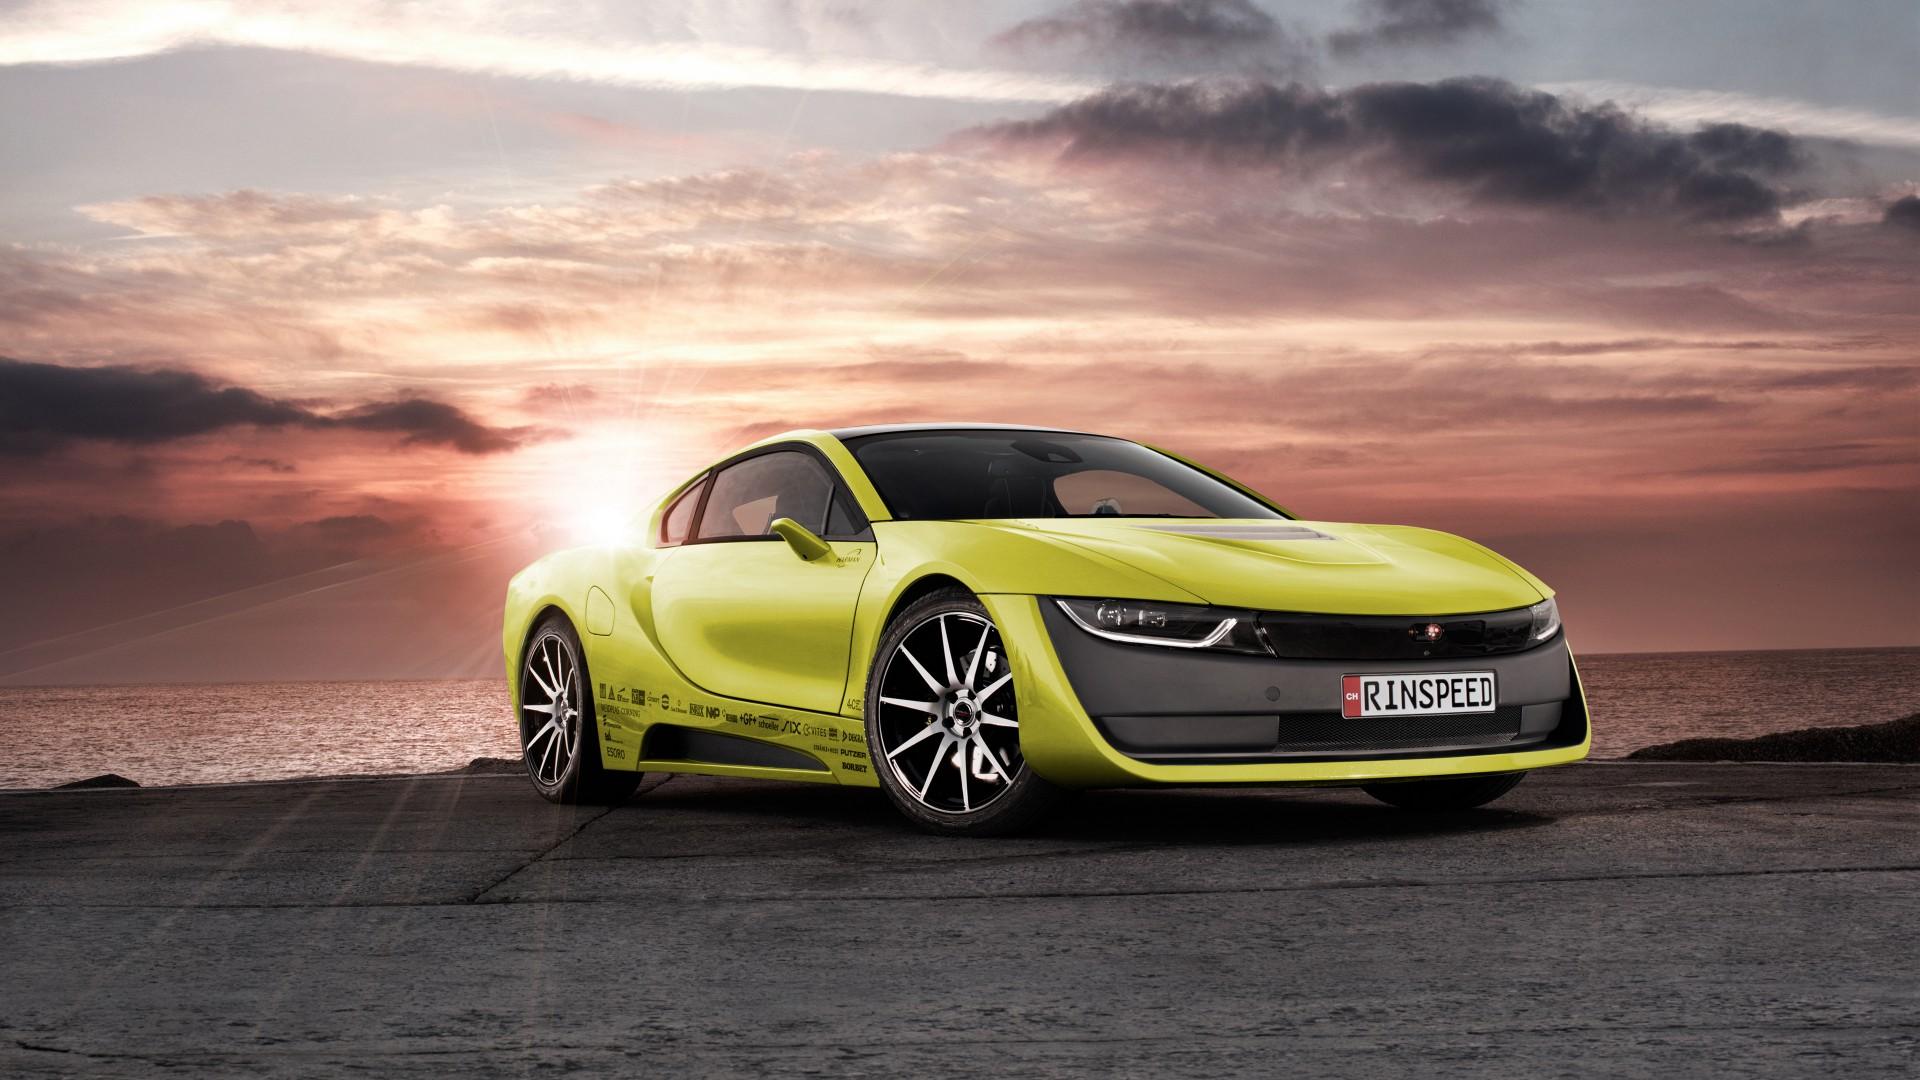 Bmw I8 Car Concept 4k Hd Desktop Wallpaper For 4k Ultra Hd: Rinspeed Etos BMW I8 Concept Wallpaper